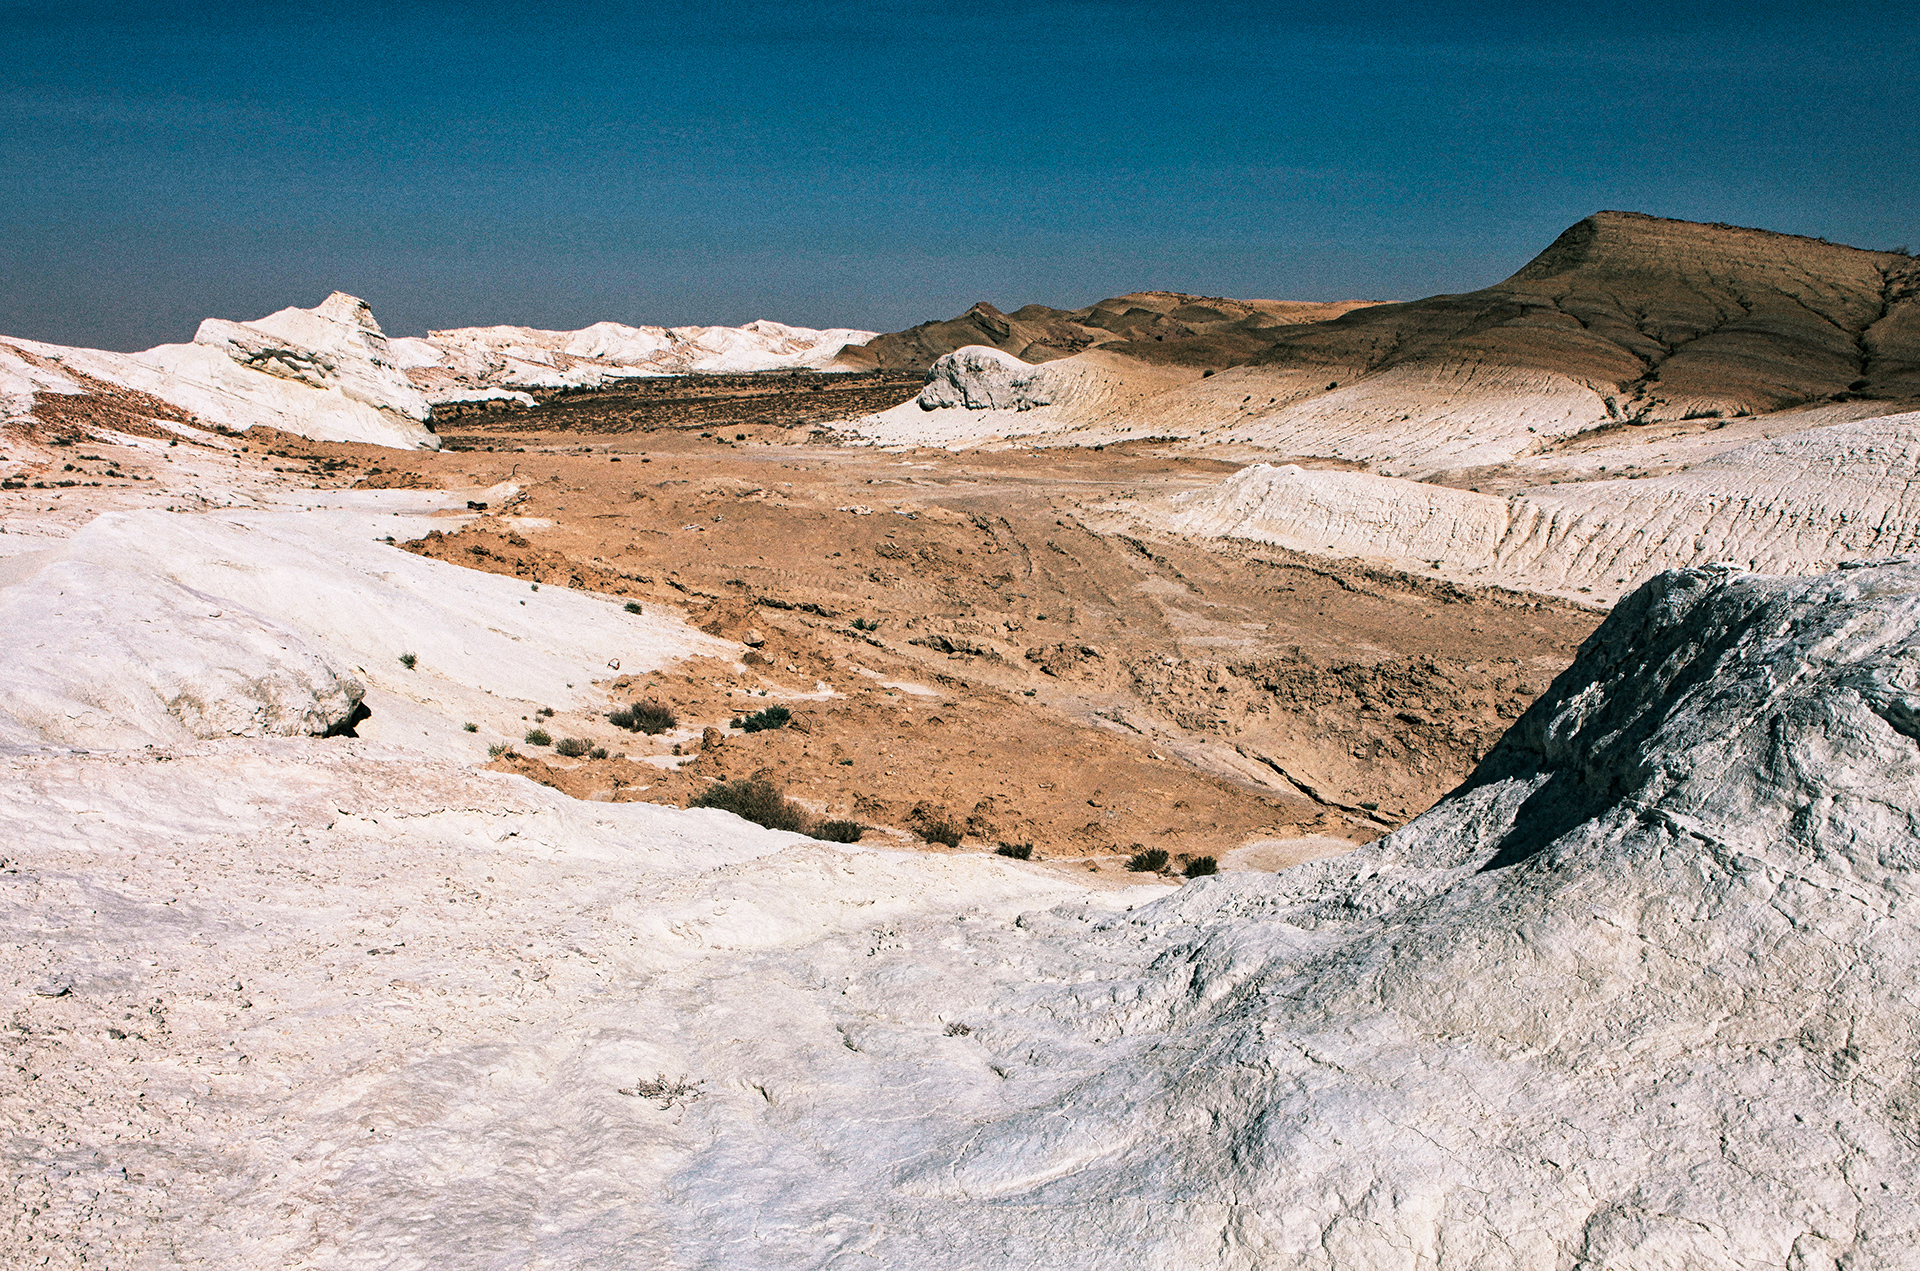 Chalk cliffs, Boszhira tract, Mangystau Province, Kazakhstan